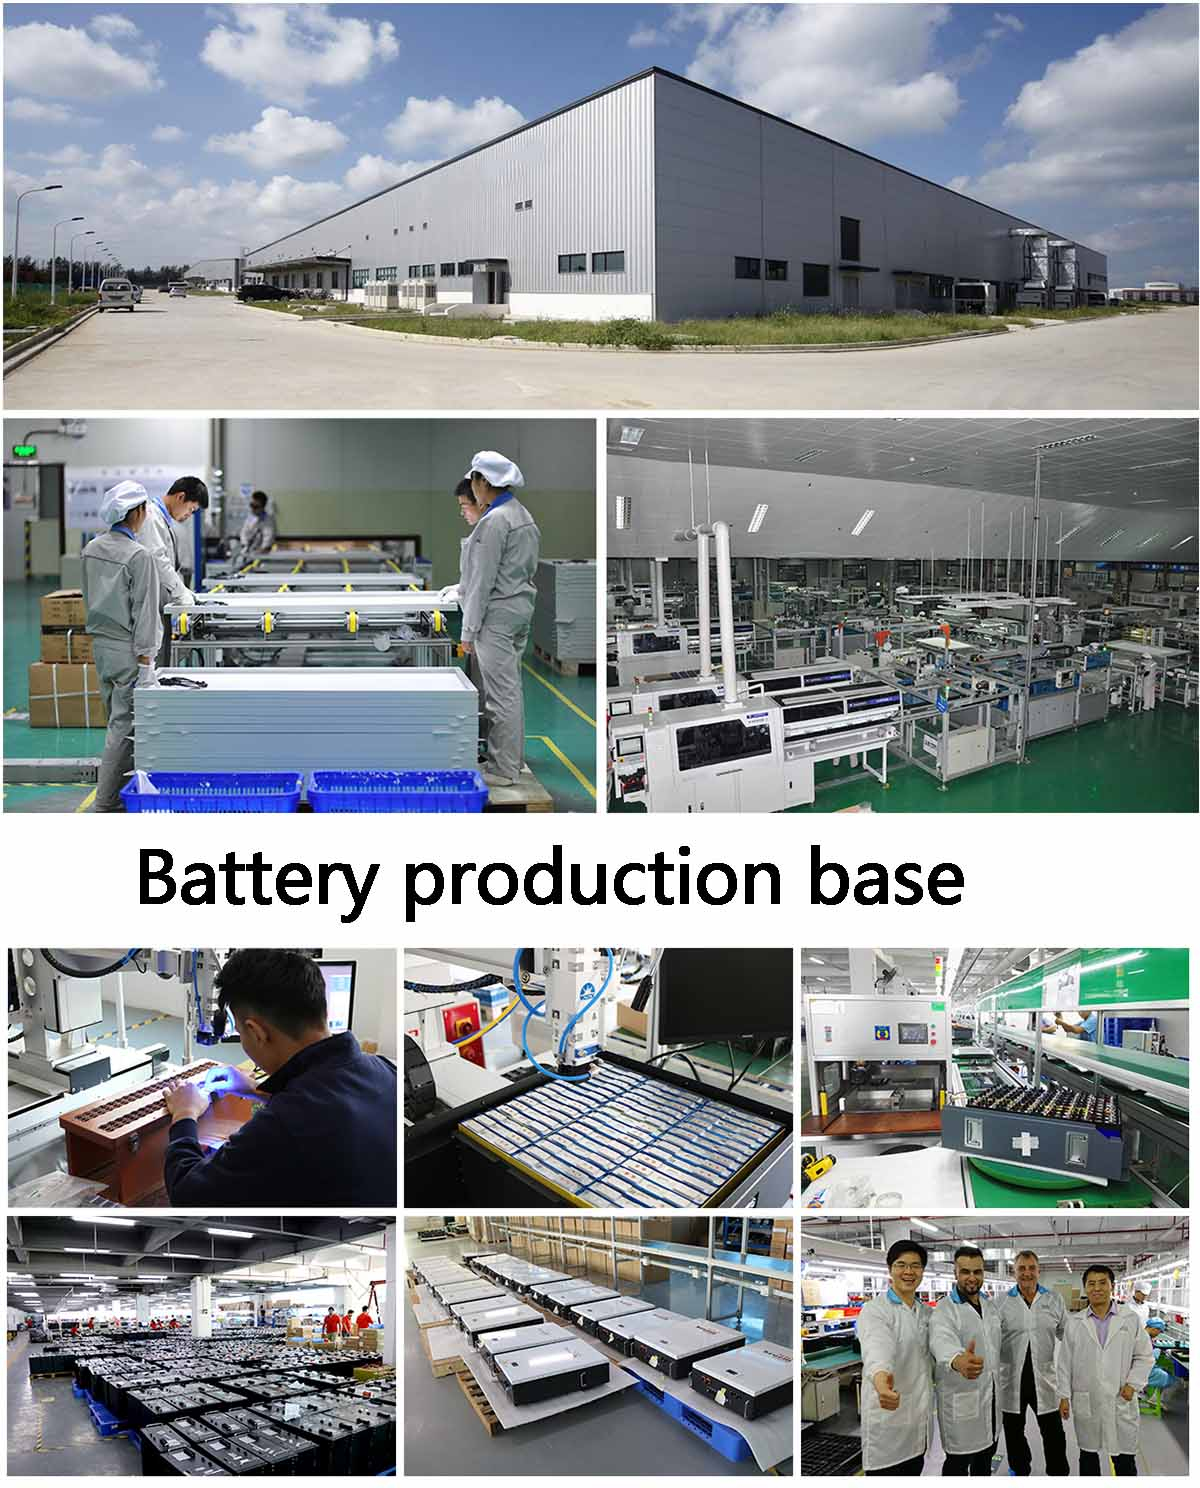 Battery production base